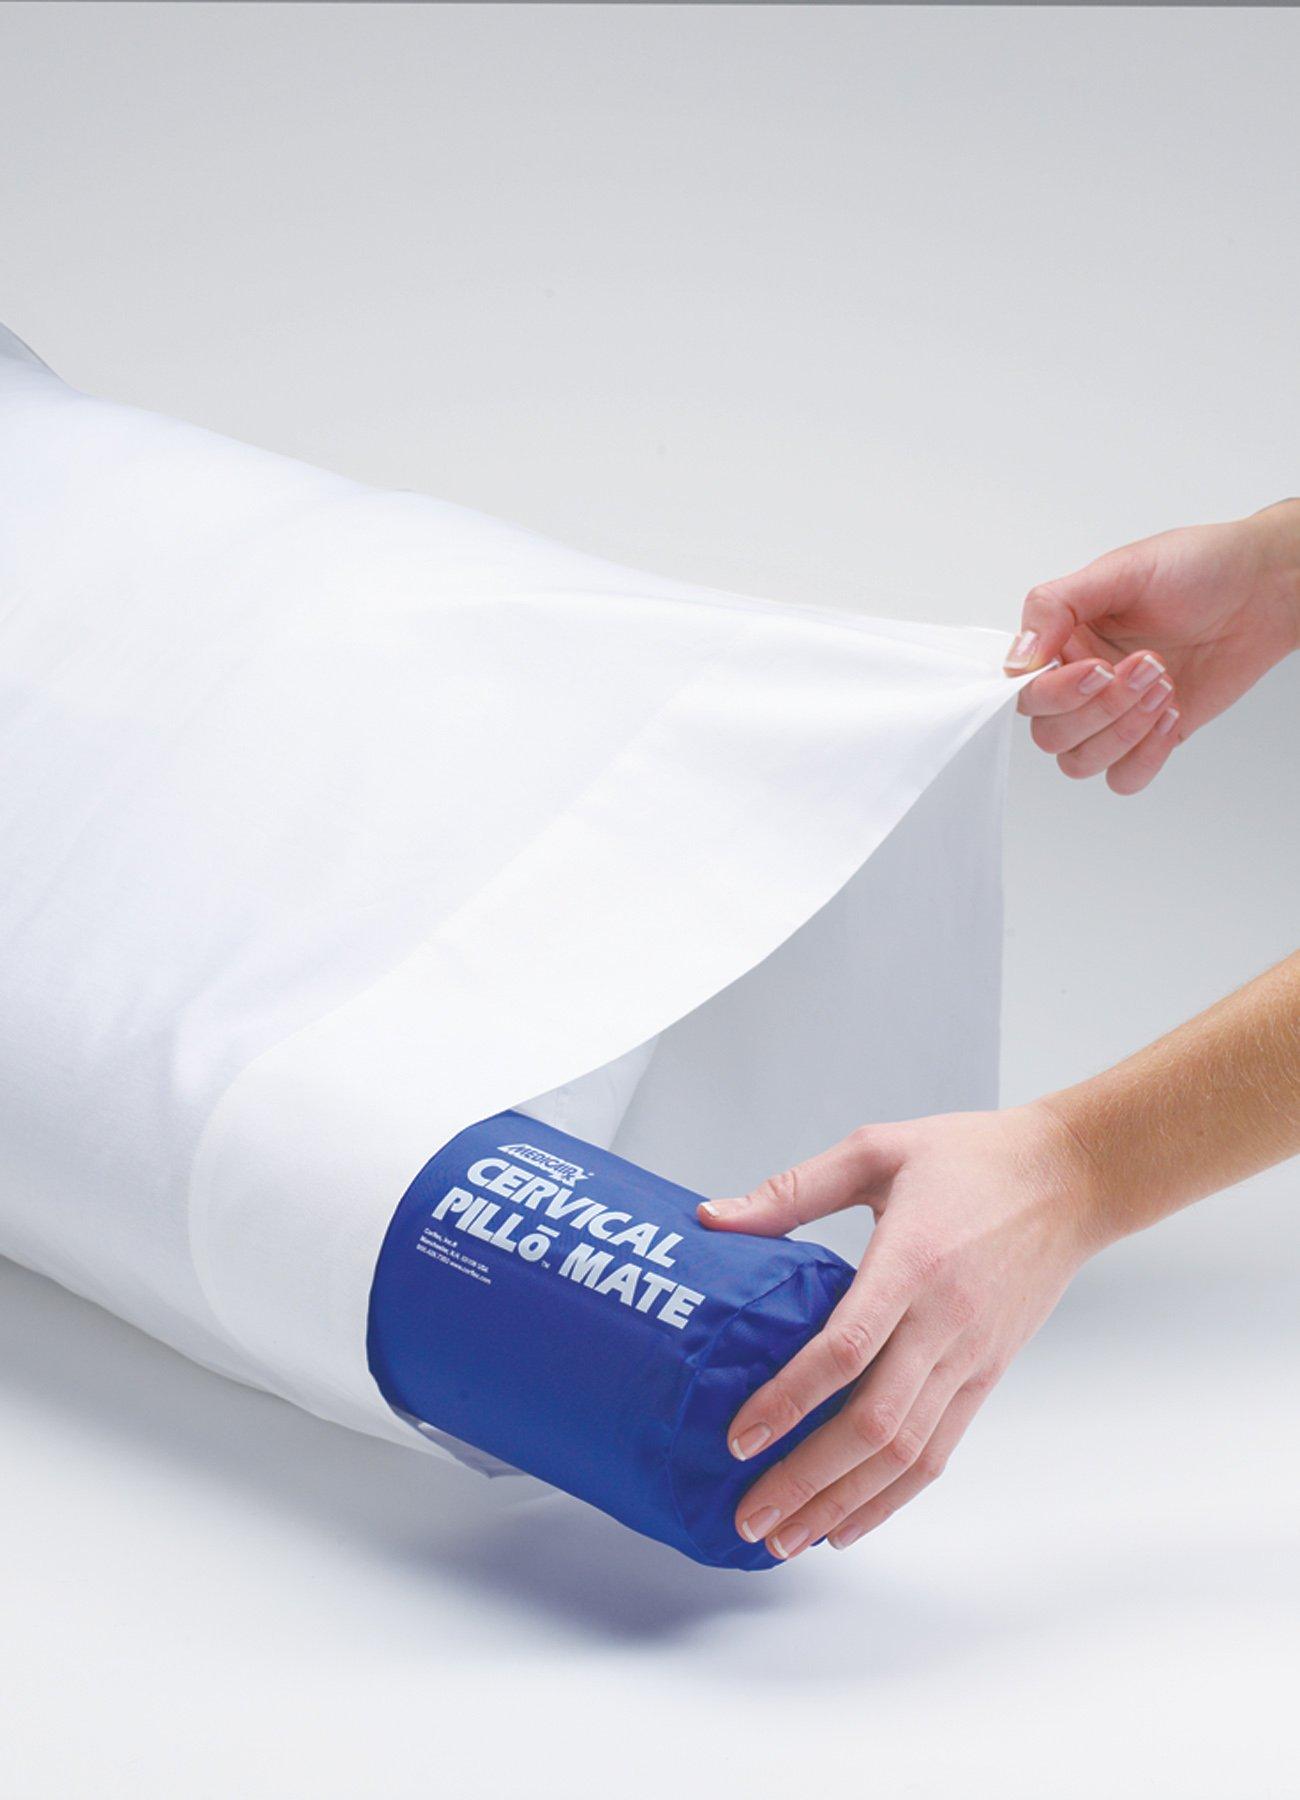 Corflex Medic Air Cervical Sleep Pillow - Blue - Case of 12